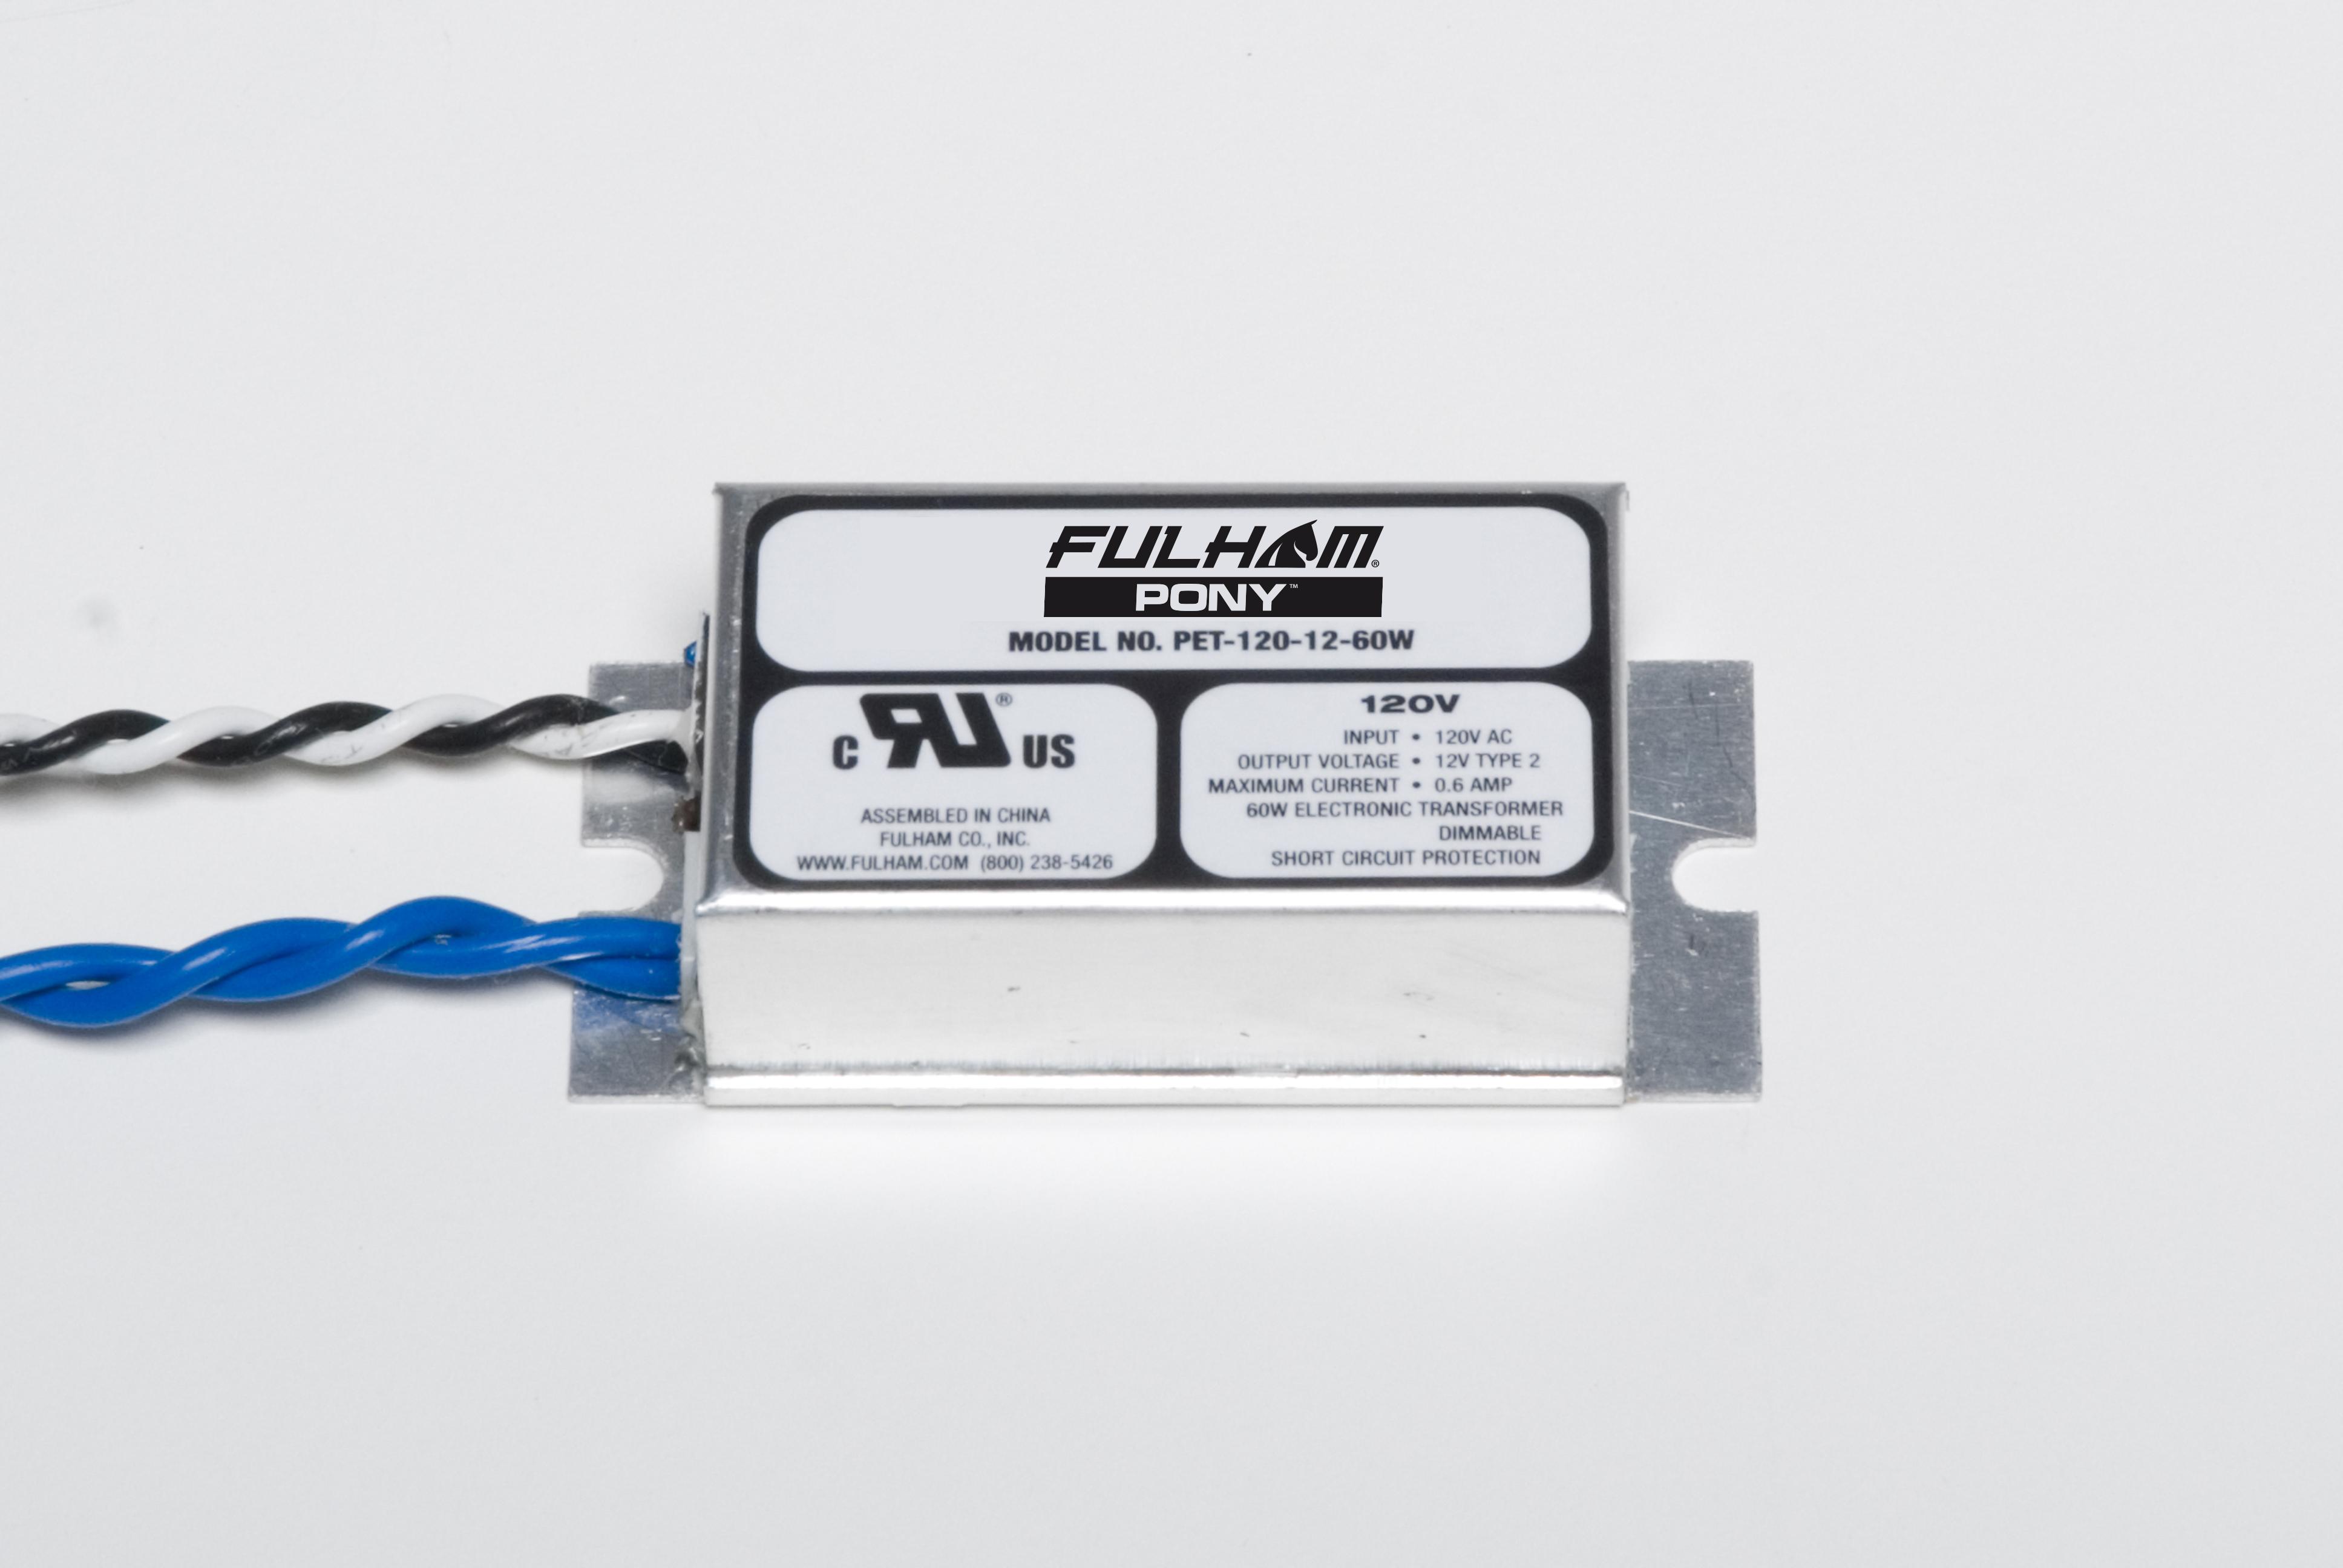 Fulham,PET-120-12-60,PONY Electronic Transformer - Low Voltage Step Down - 120V AC --> 12V DC - 60W